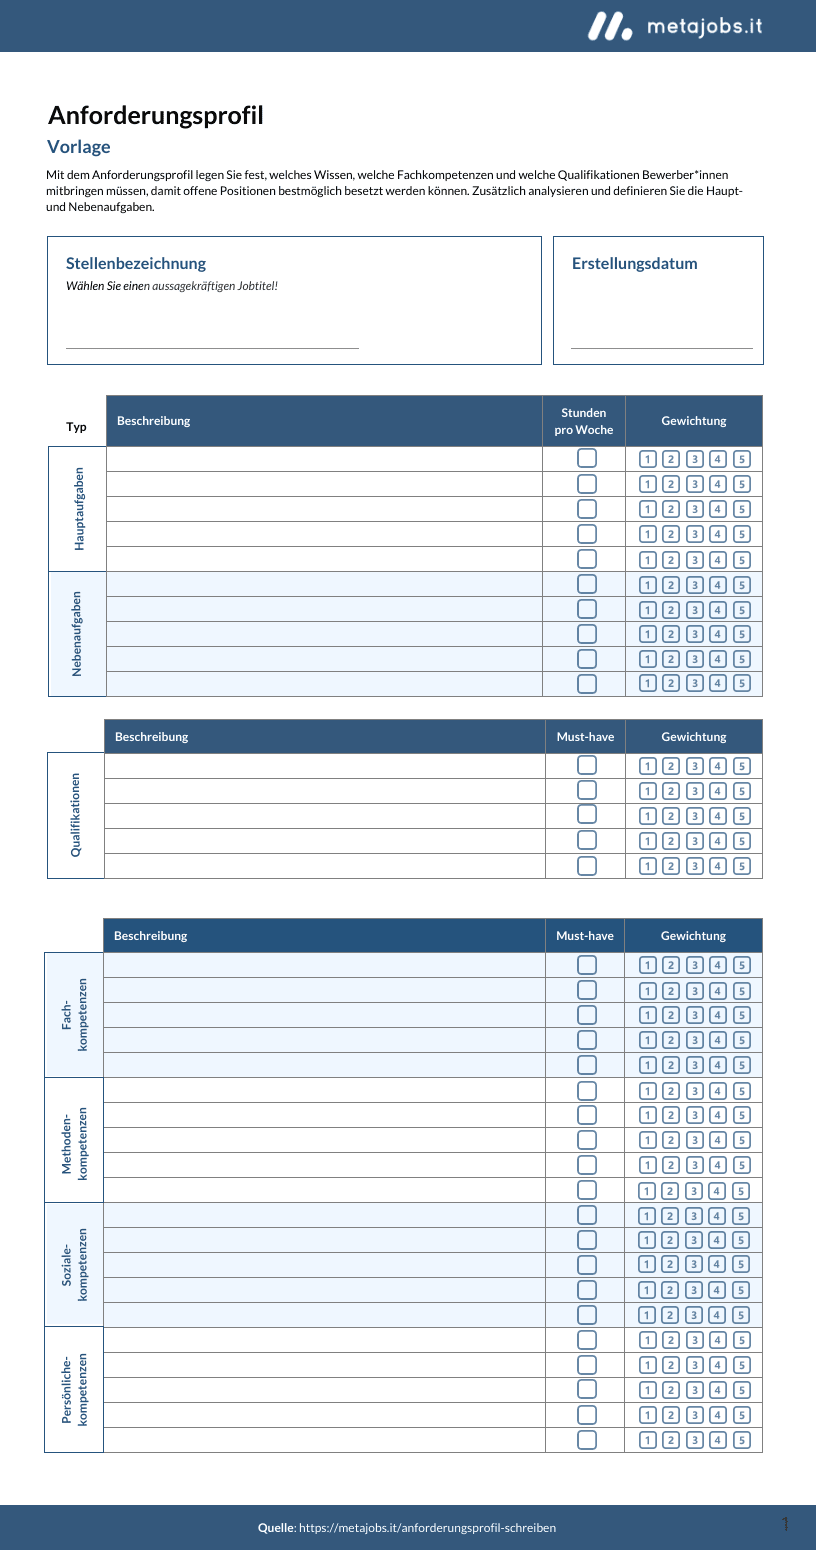 Anforderungsprofil erstellen Muster - Infografik